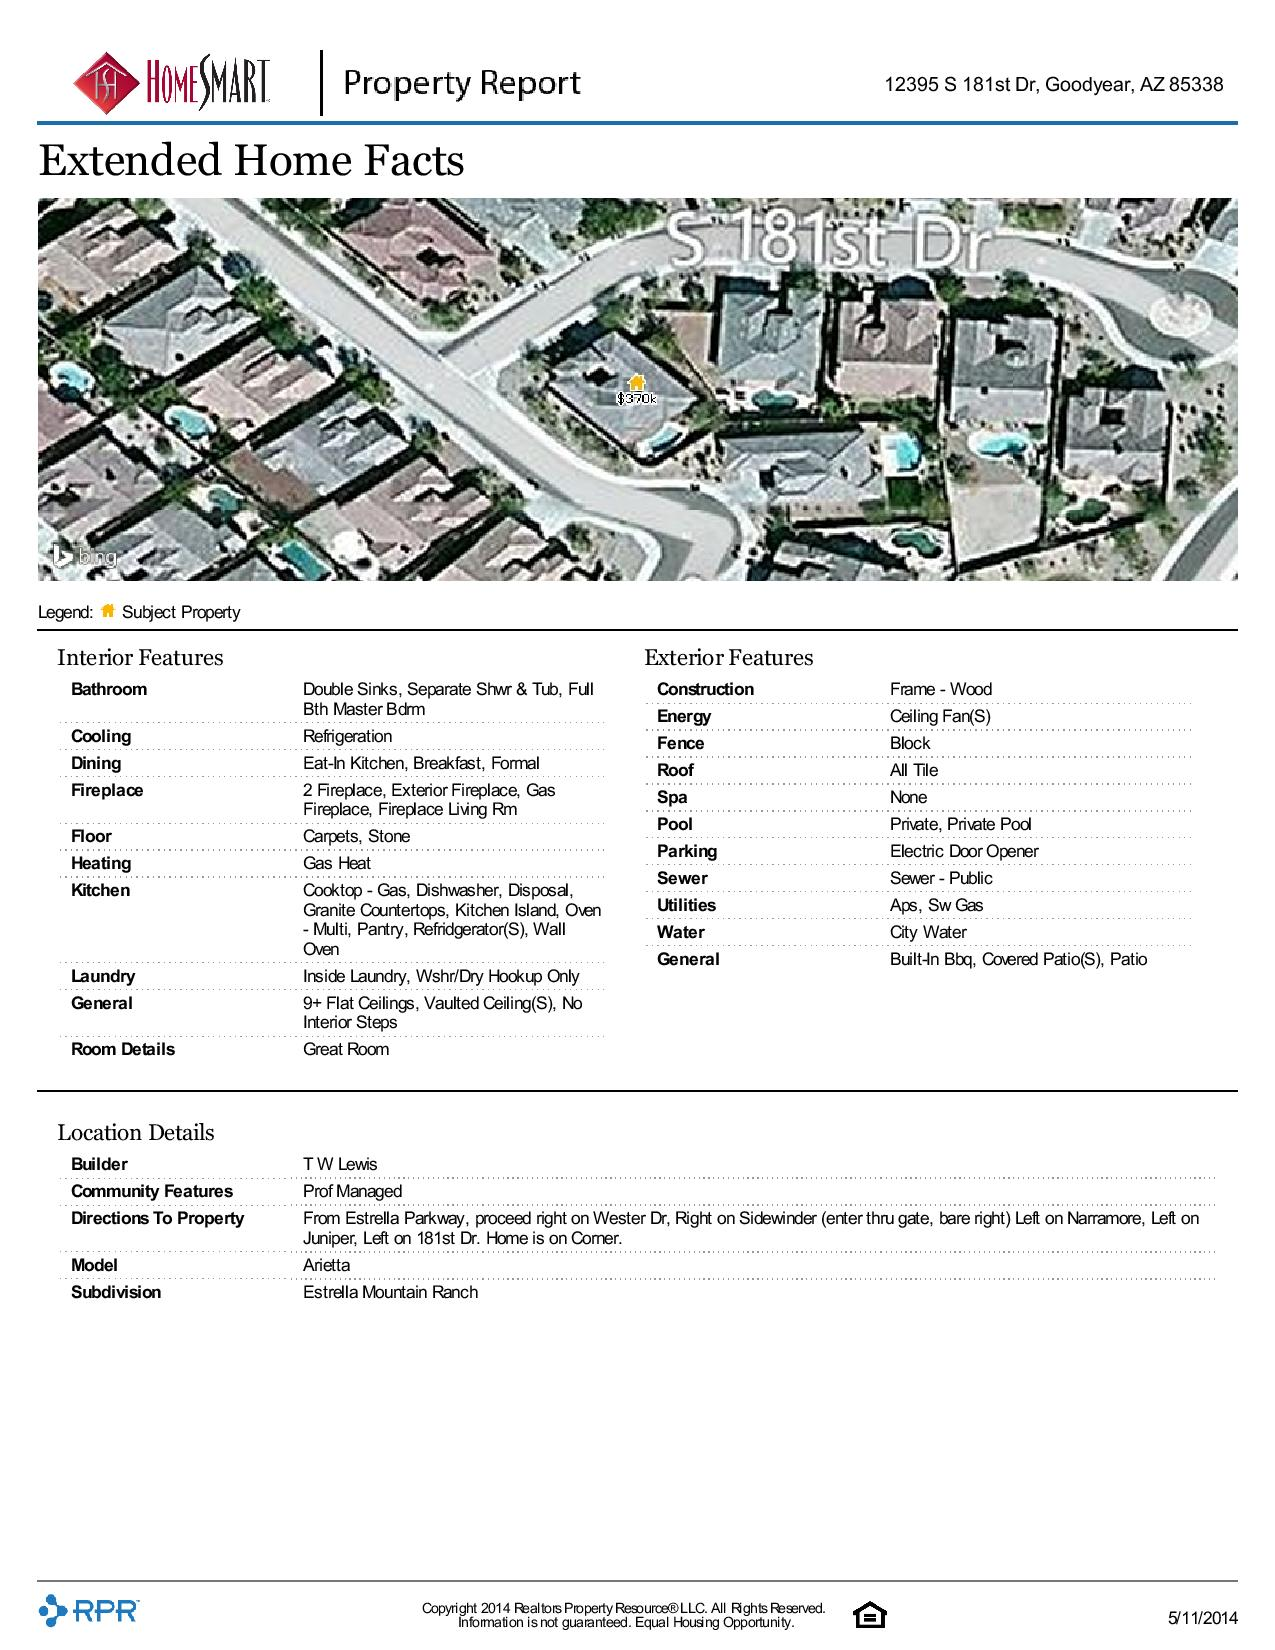 12395-S-181st-Dr-Goodyear-AZ-85338-page-004